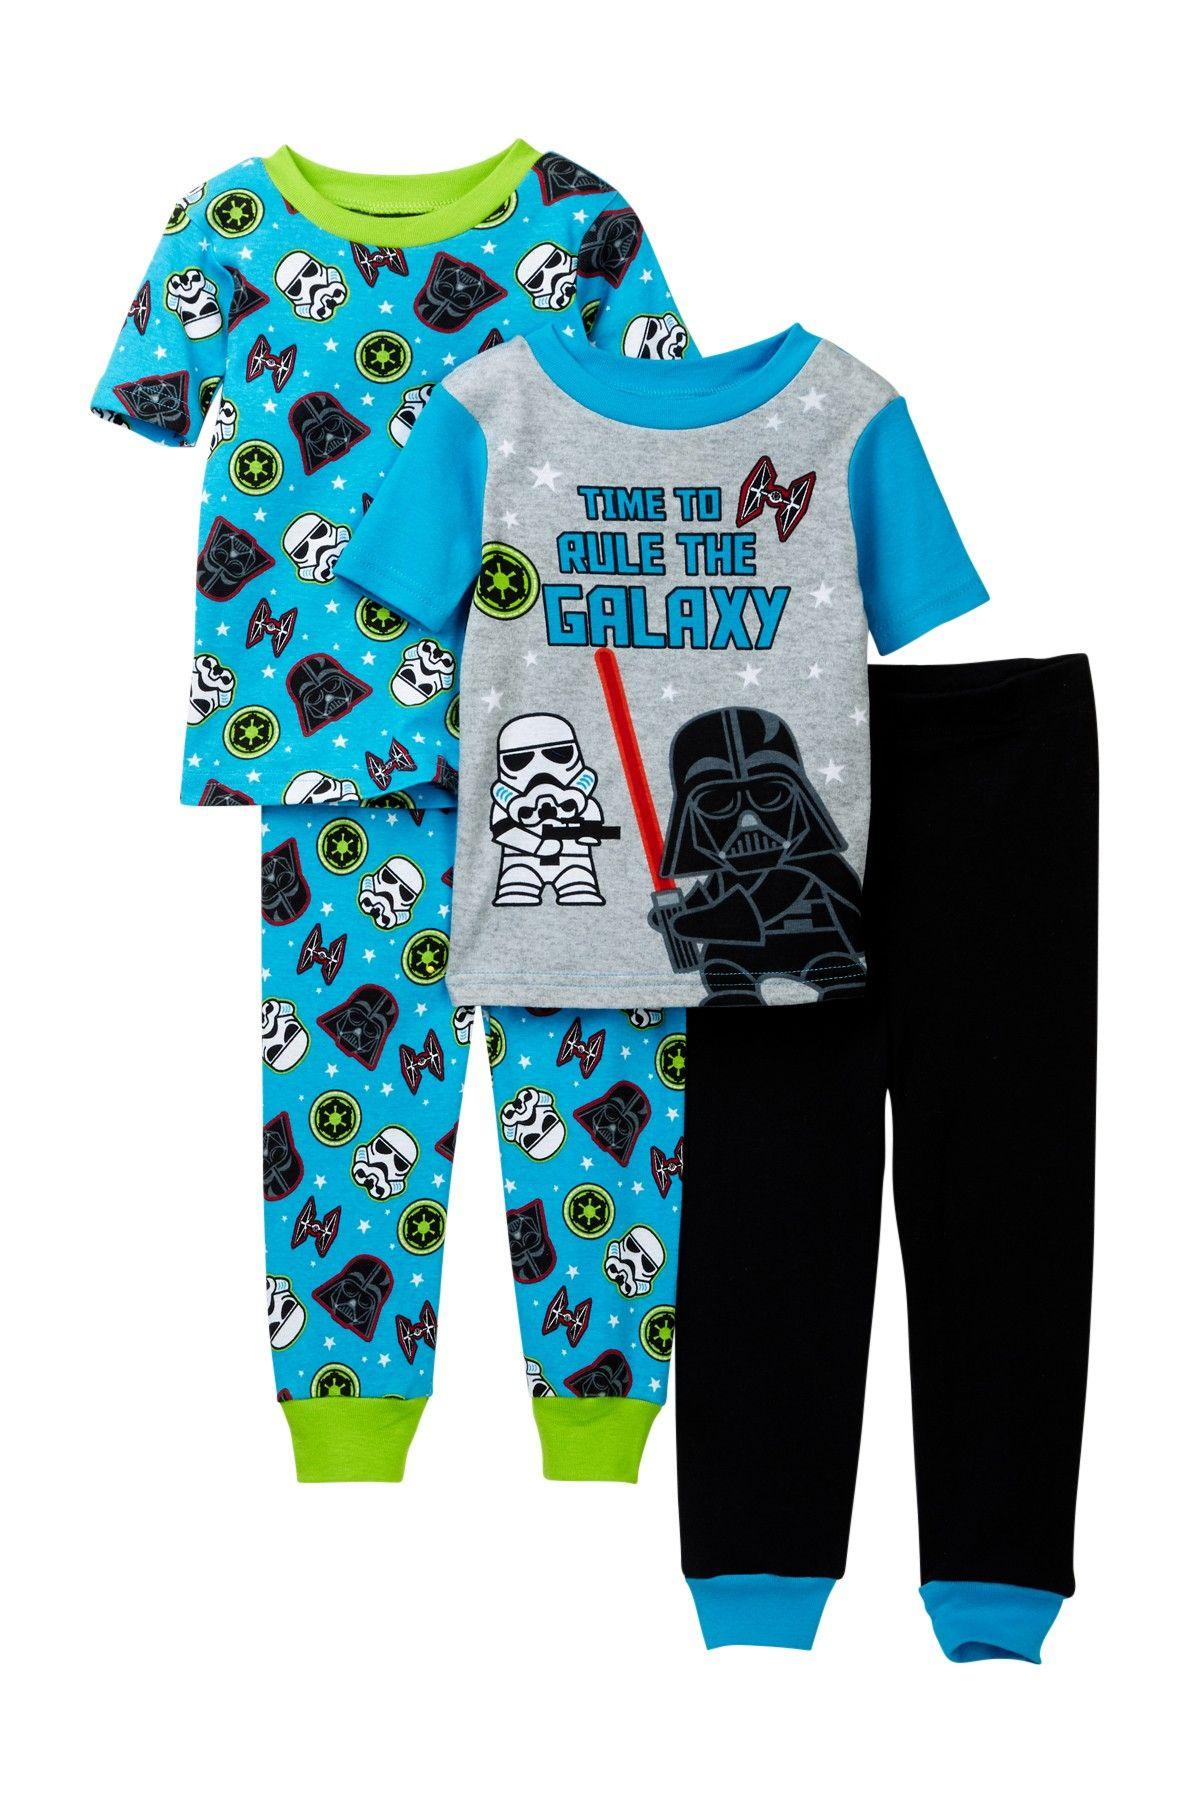 de5be2b6e AME | Star Wars Darth Vader Rule the Galaxy Cotton PJs - Set of 2 (